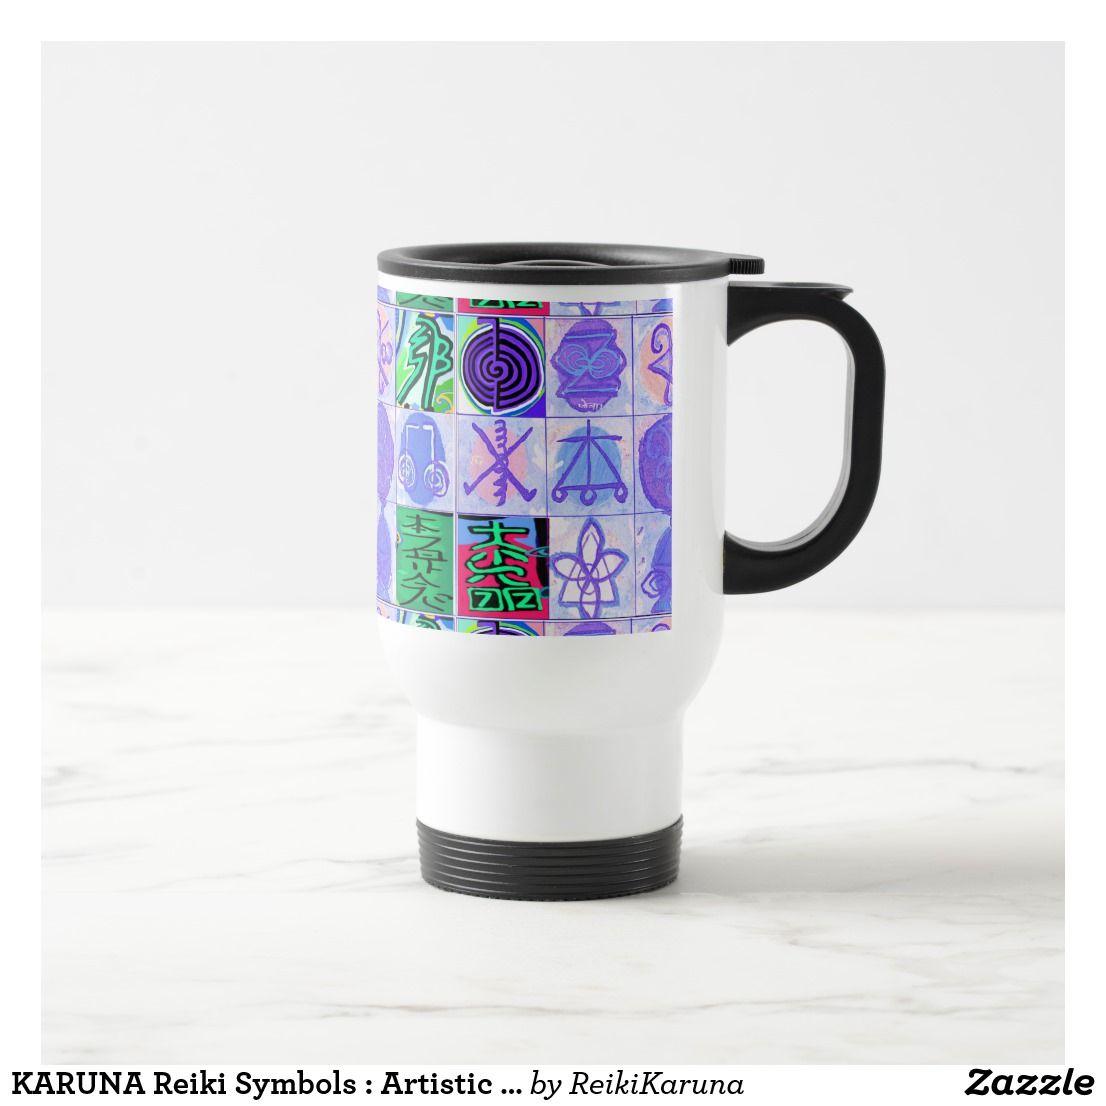 Karuna reiki symbols artistic rendering travel mug